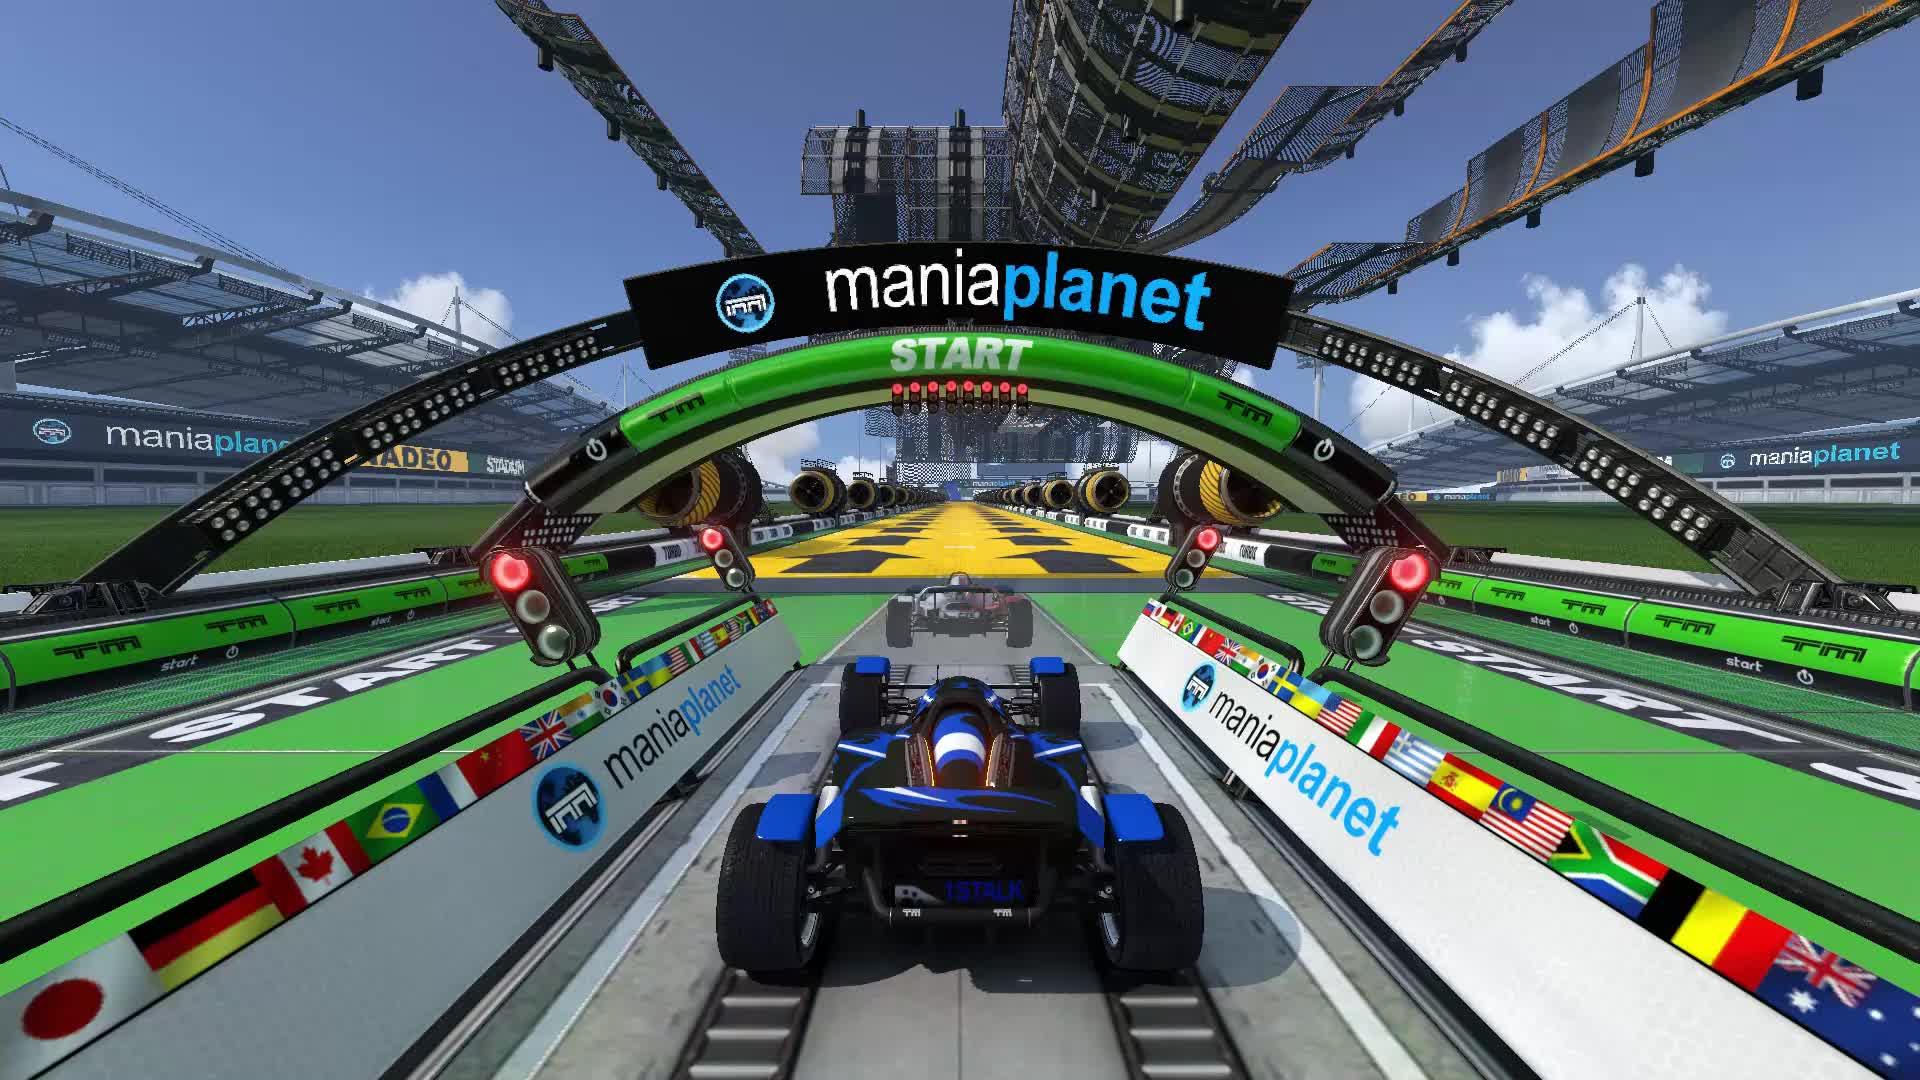 Trackmania² Stadium - Kindheitstrauma GIFs